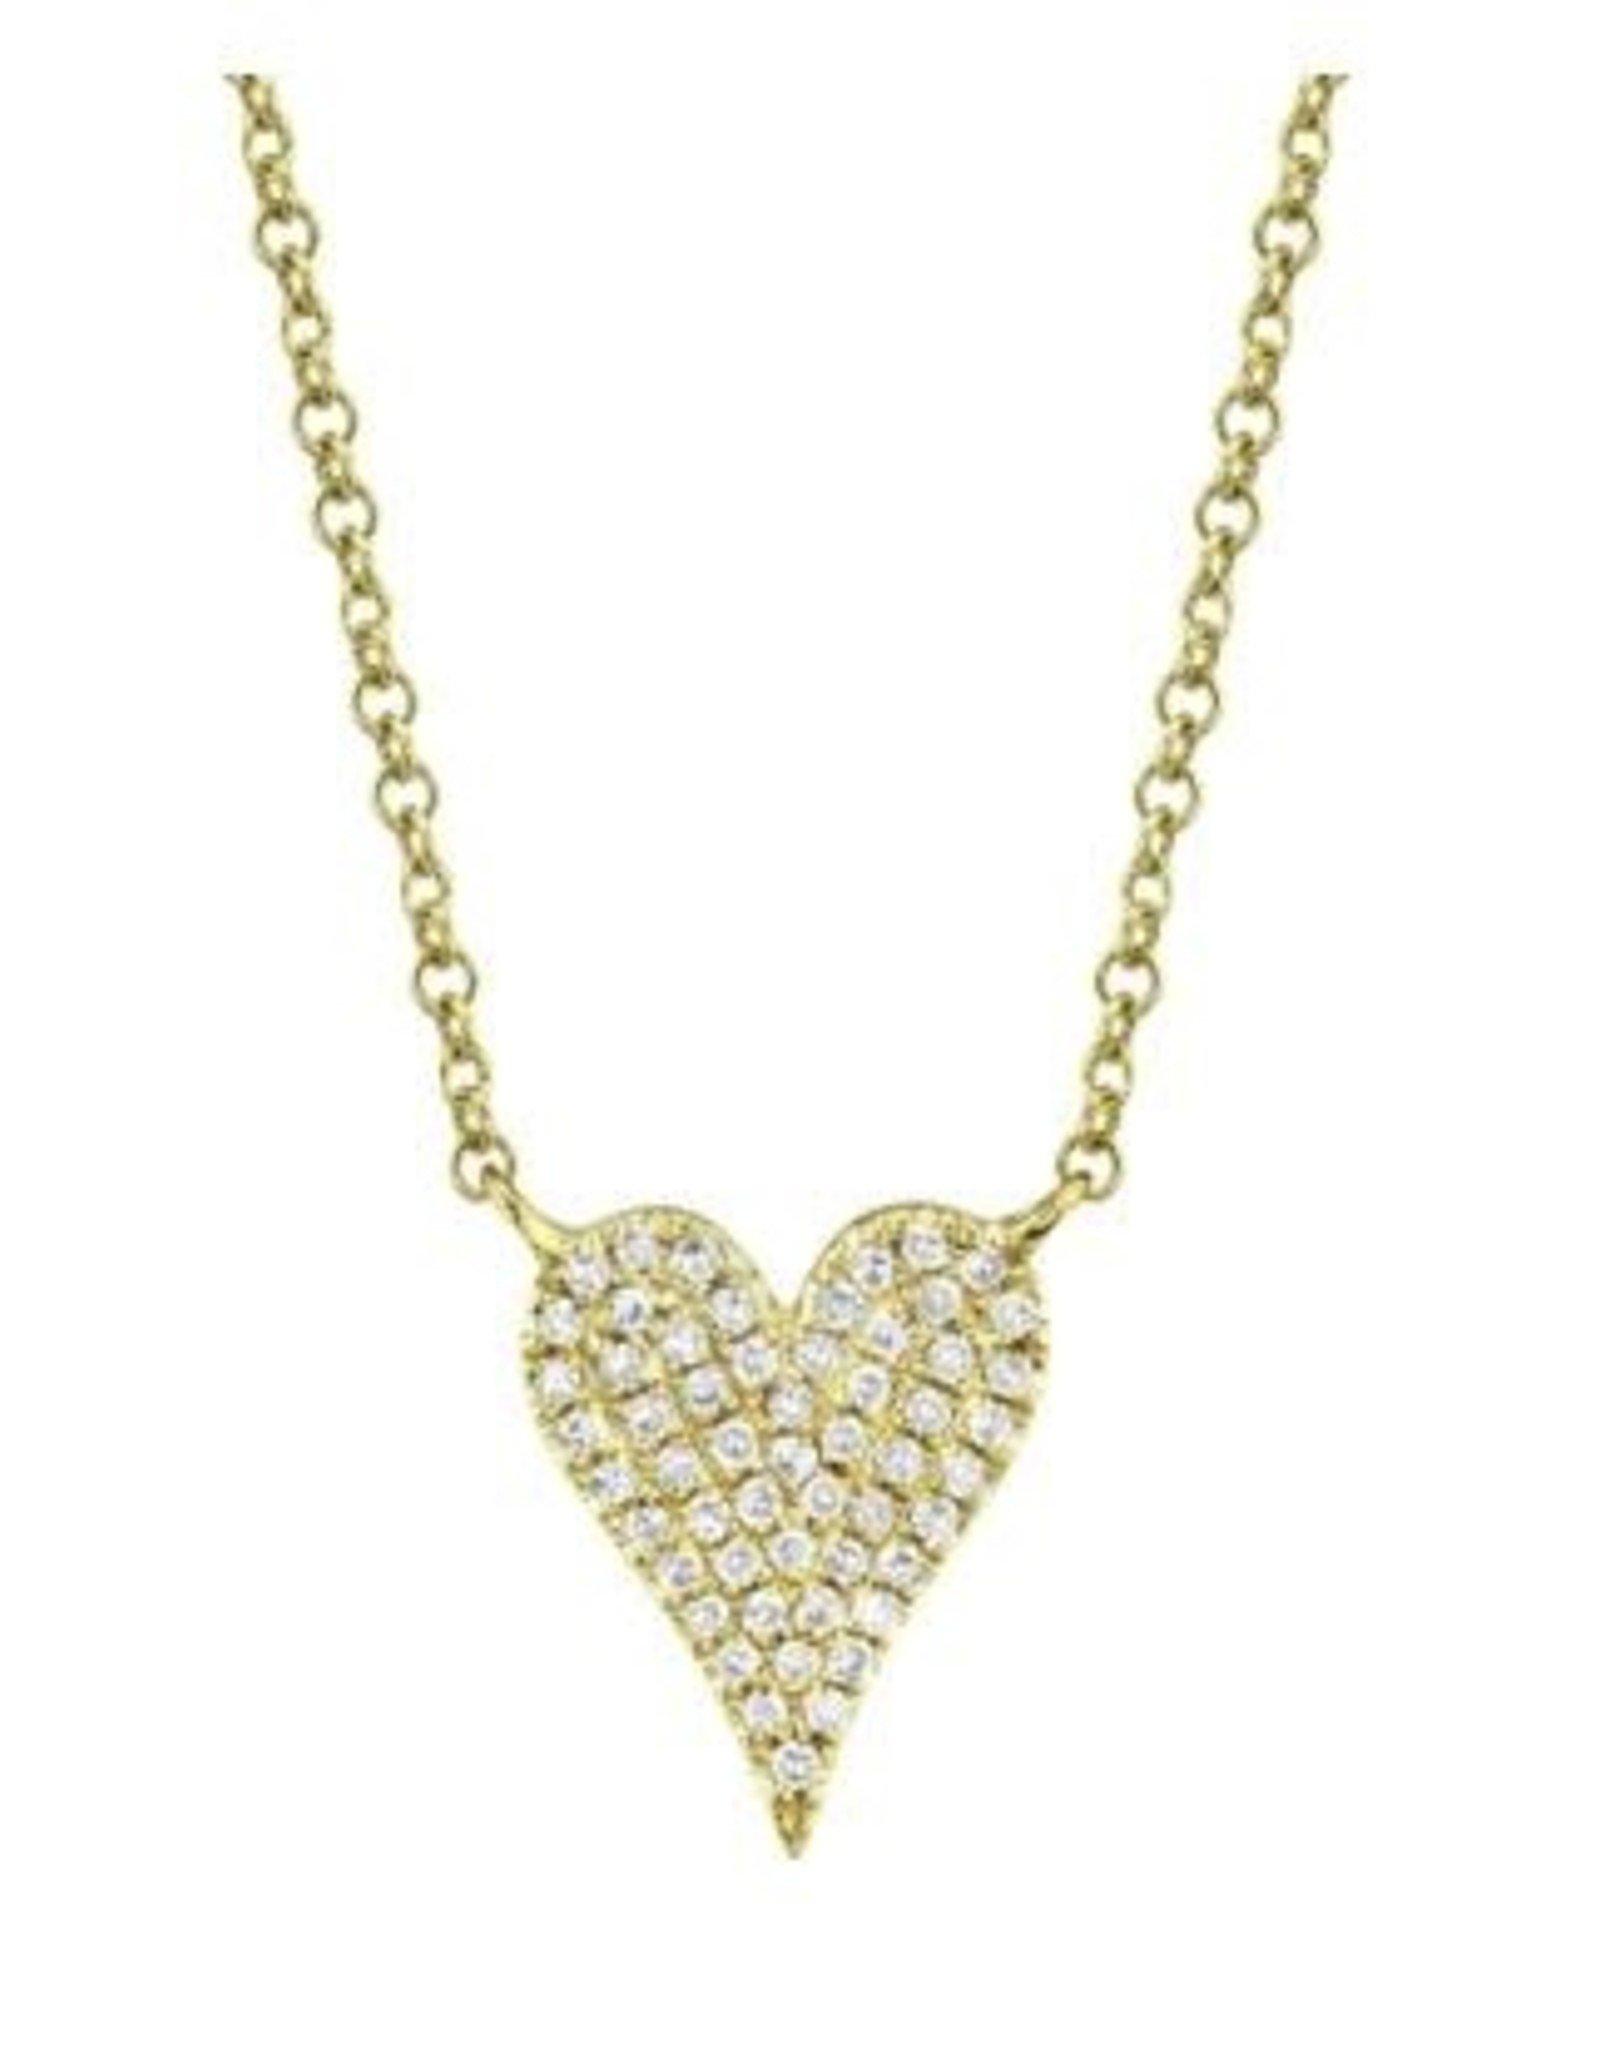 14K Yellow Gold Petite Pave Diamond Heart Necklace,  D: 0.11ct